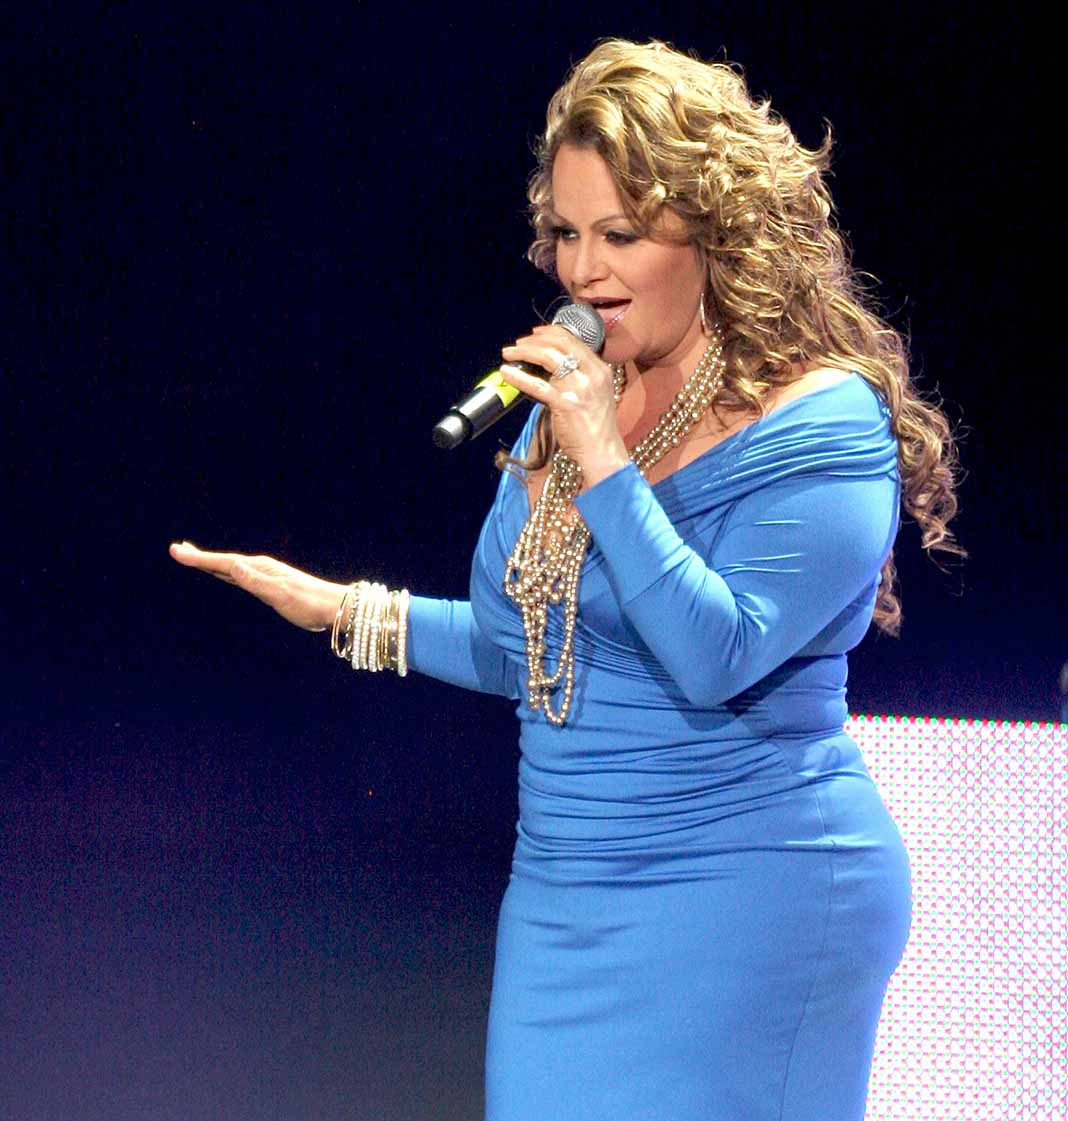 La música de Jenni Rivera ha sido la elegida por Frida Sofía para